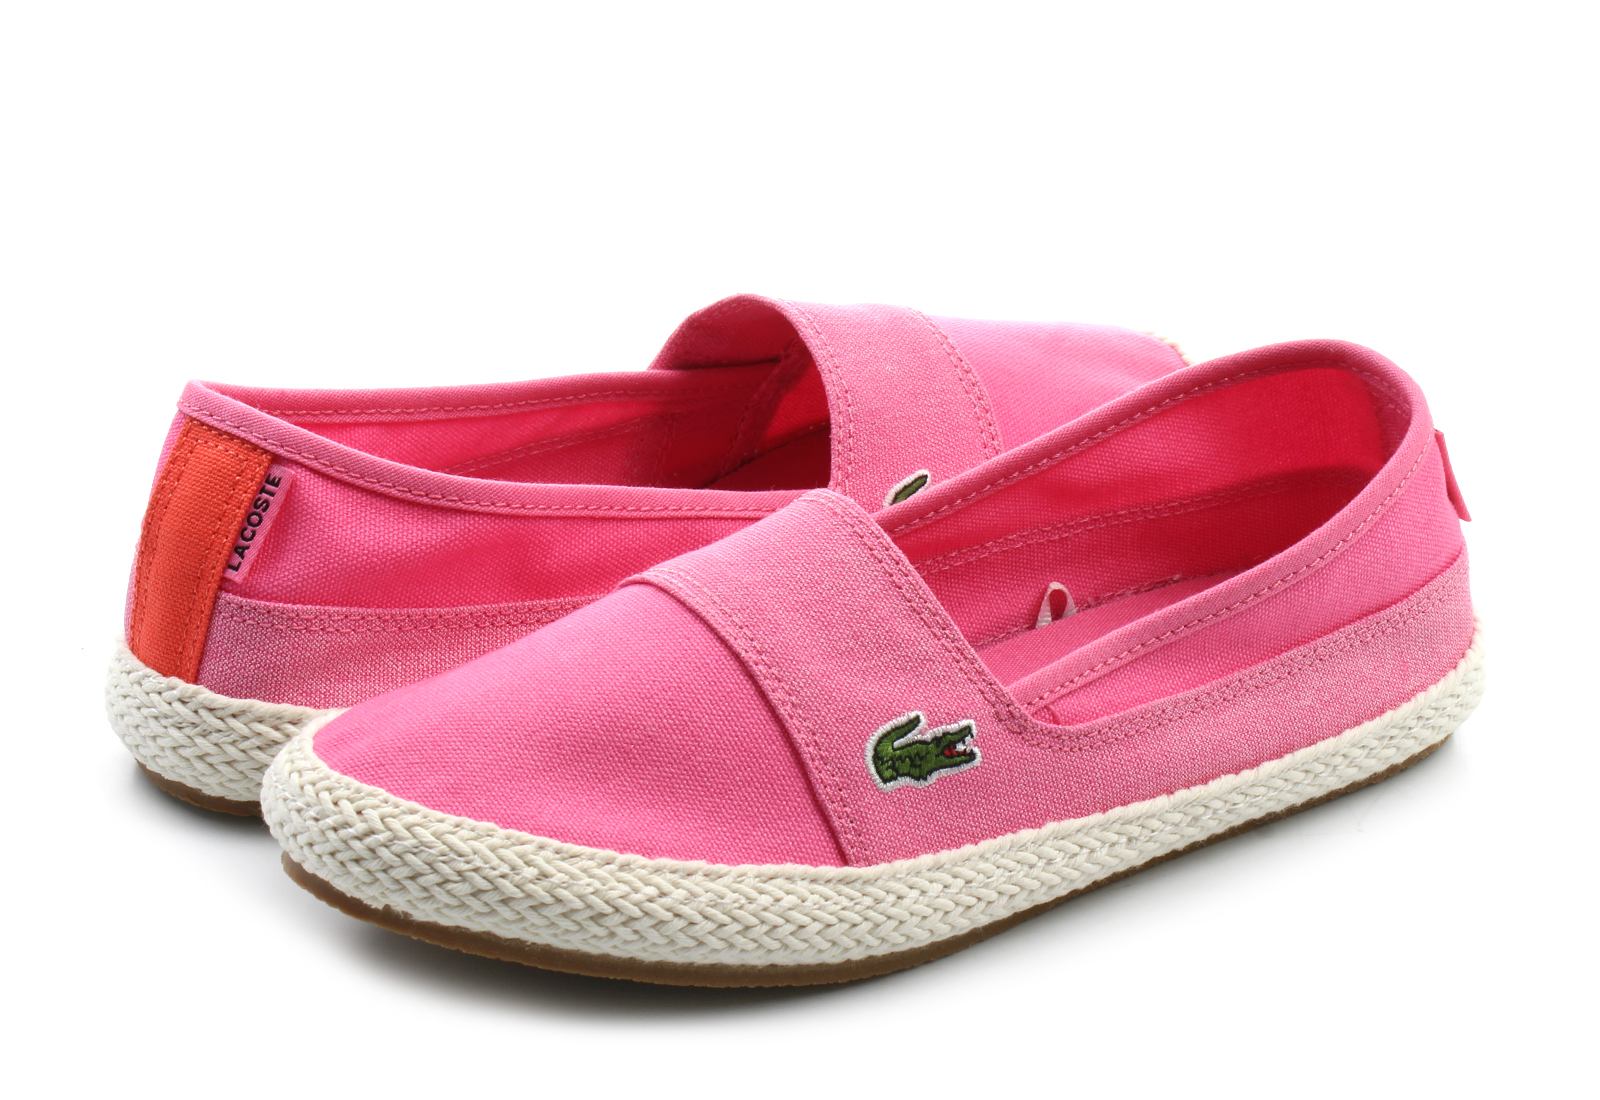 Lacoste Cipő - Marice - 182caw0042-13c - Office Shoes Magyarország 38fc93b265